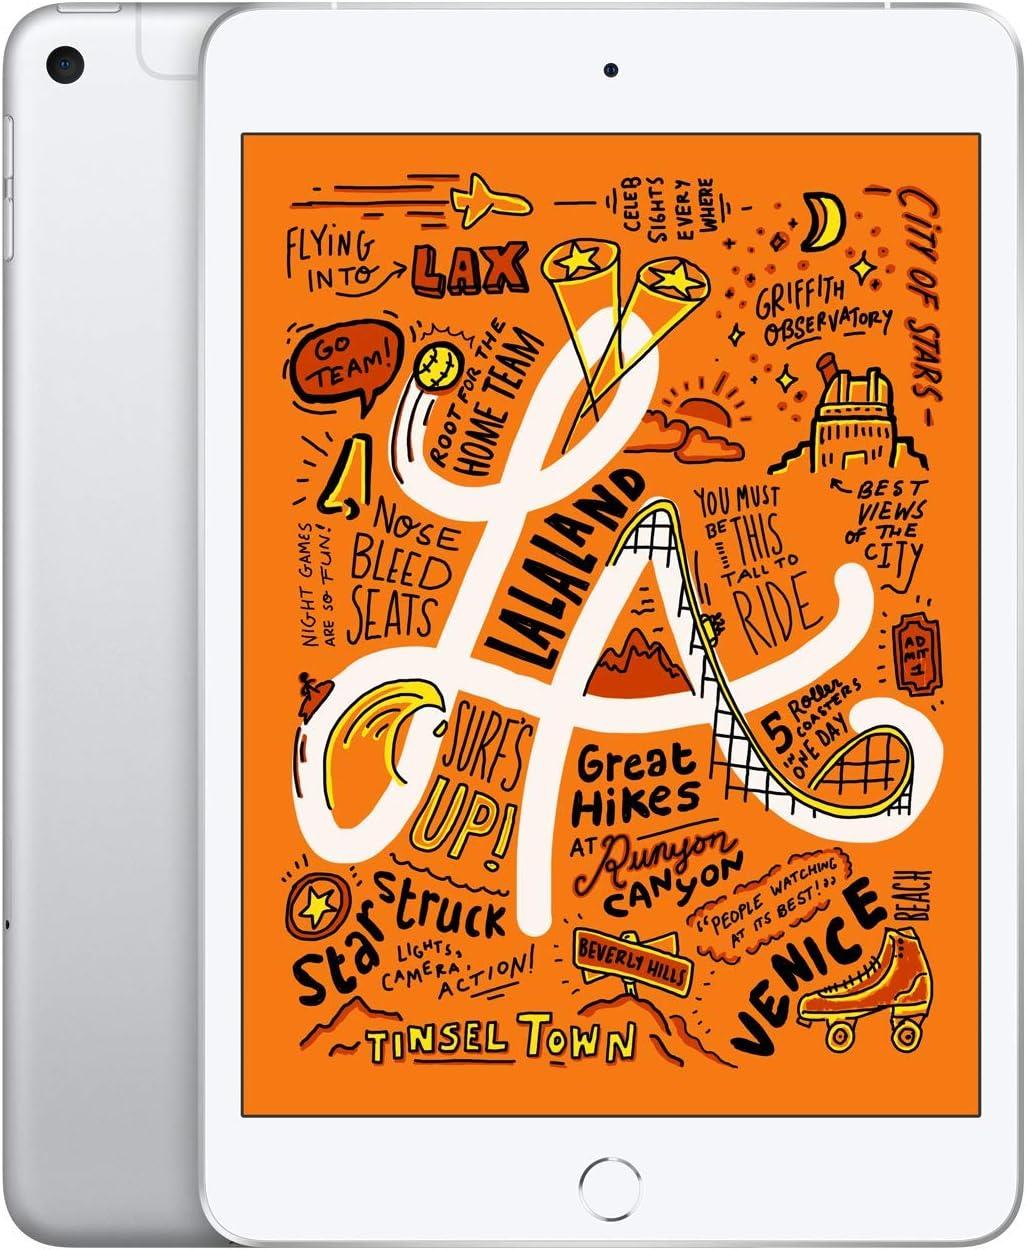 Apple iPad mini (Wi-Fi + Cellular, 64GB) - Silver (Latest Model)